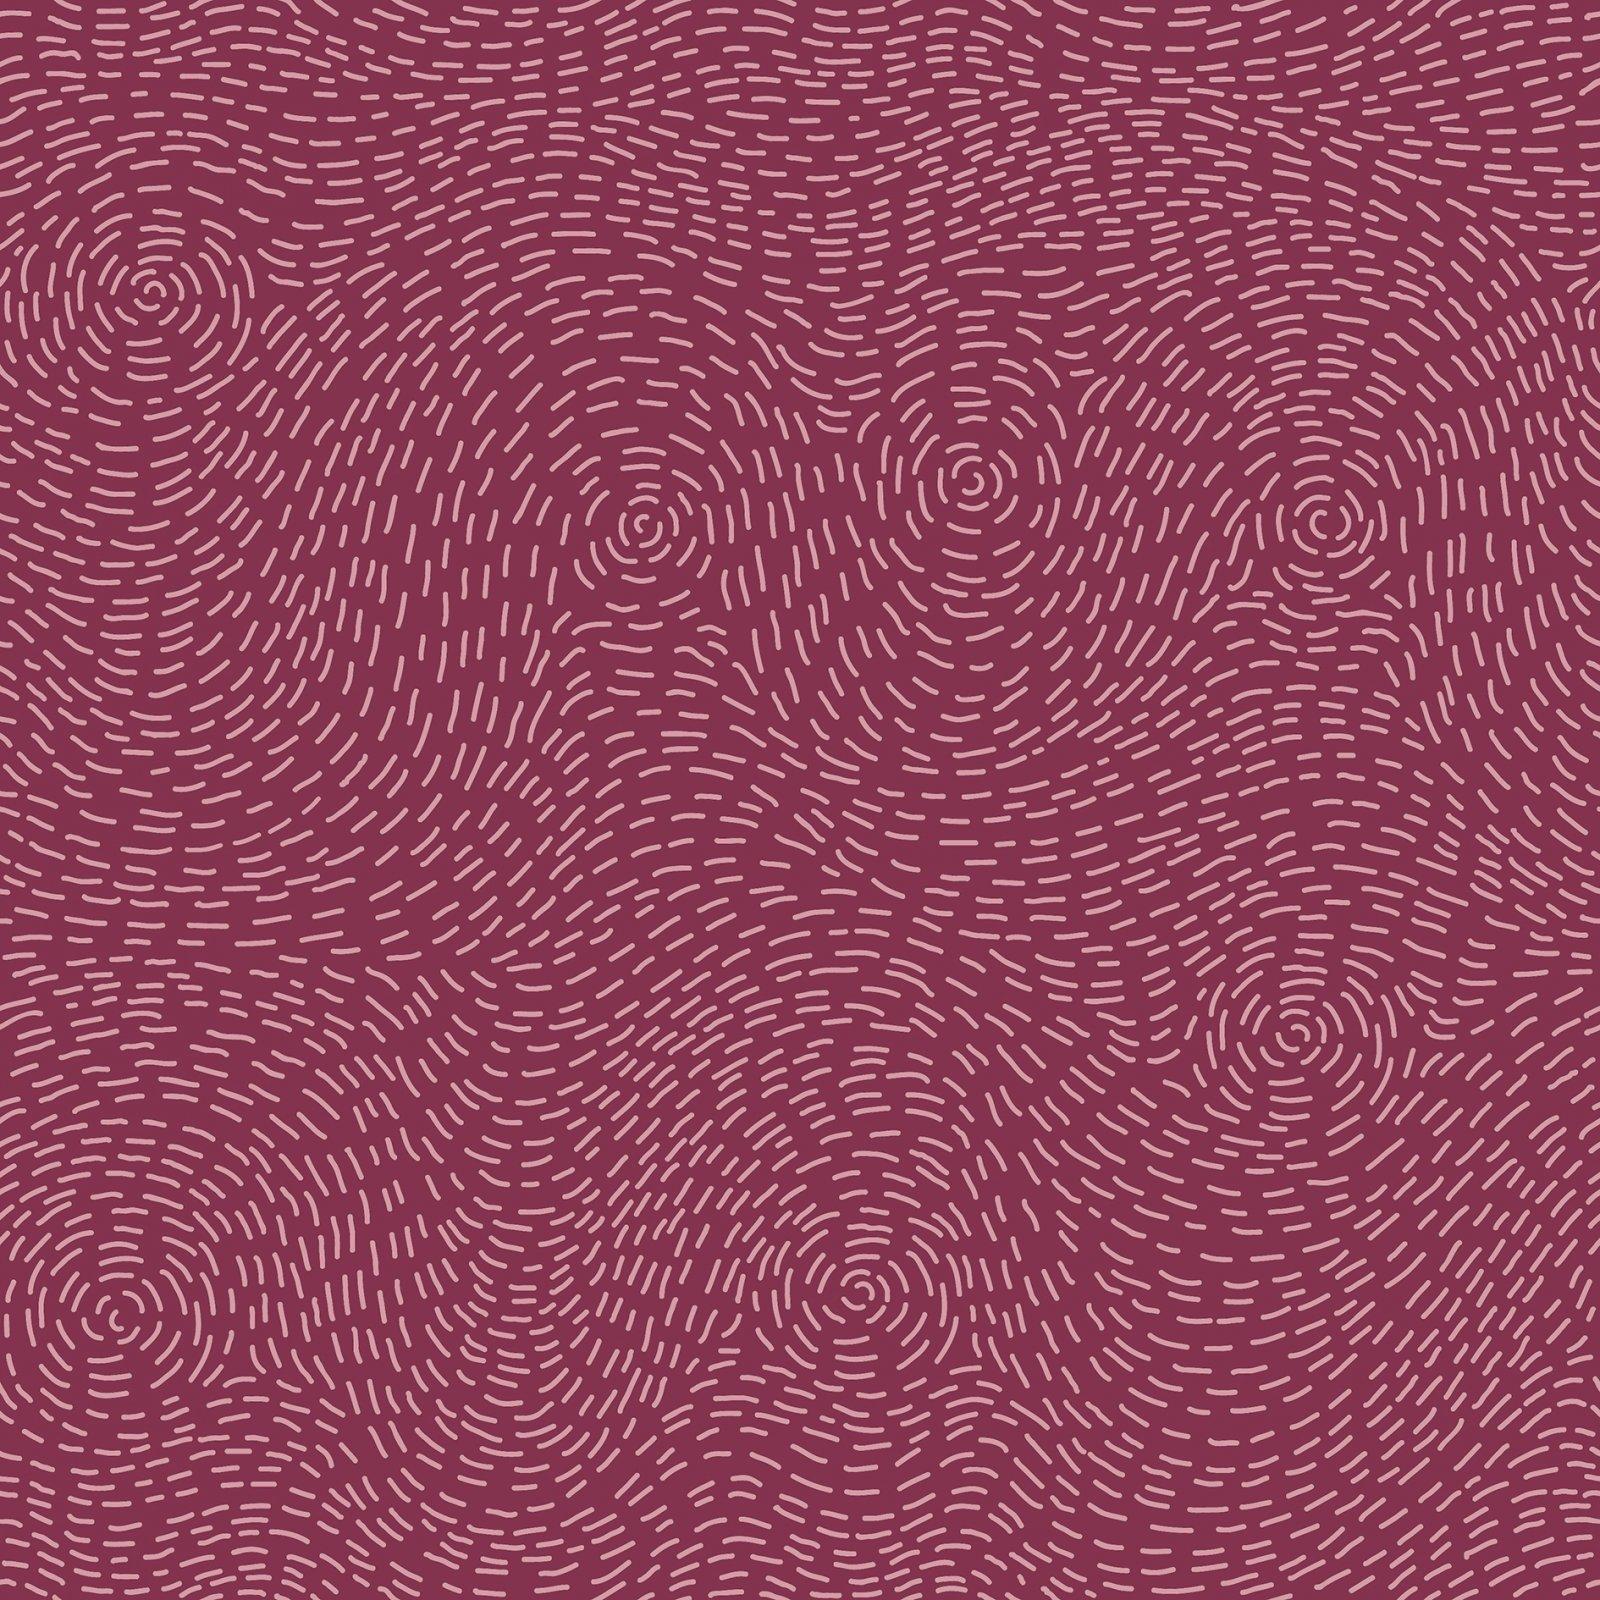 WWQSH 2021 Stitching Purple PRE-ORDER